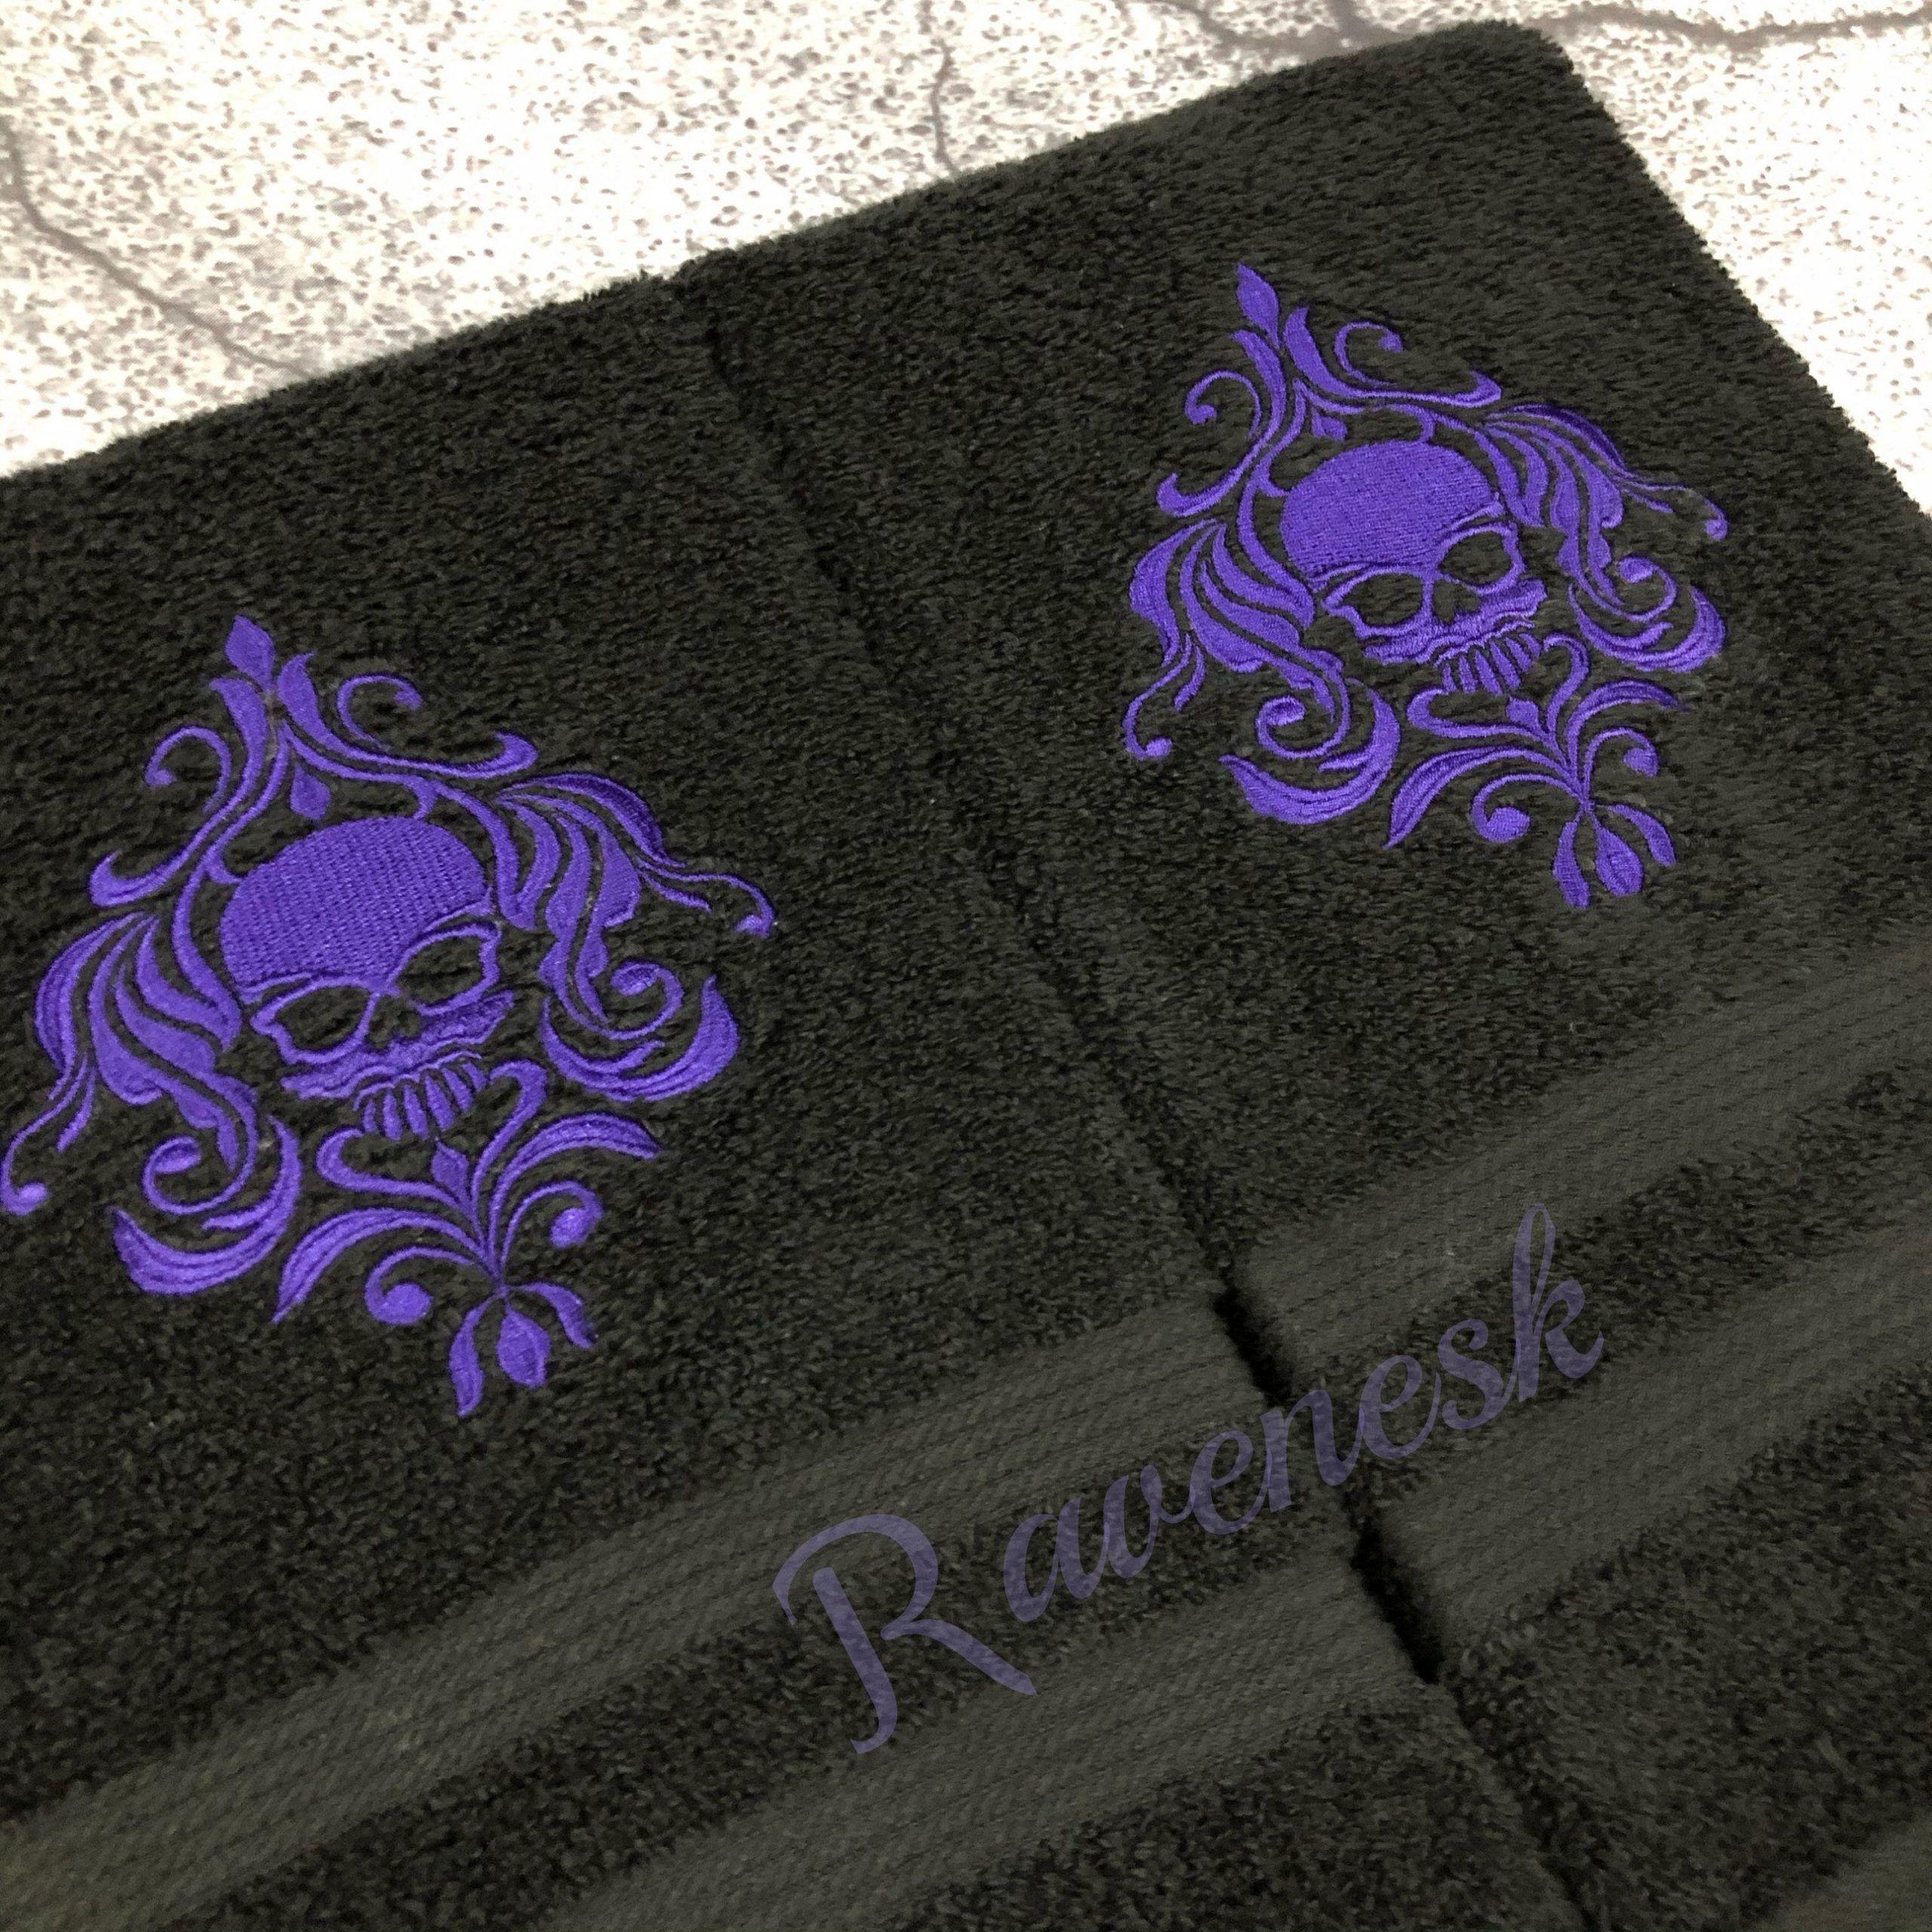 Damask skull hand towels, gothic bathroom decor, purple skulls, goth bathroom, purple and black towels, Ravenesk#bathroom #black #damask #decor #goth #gothic #hand #purple #ravenesk #skull #skulls #towels